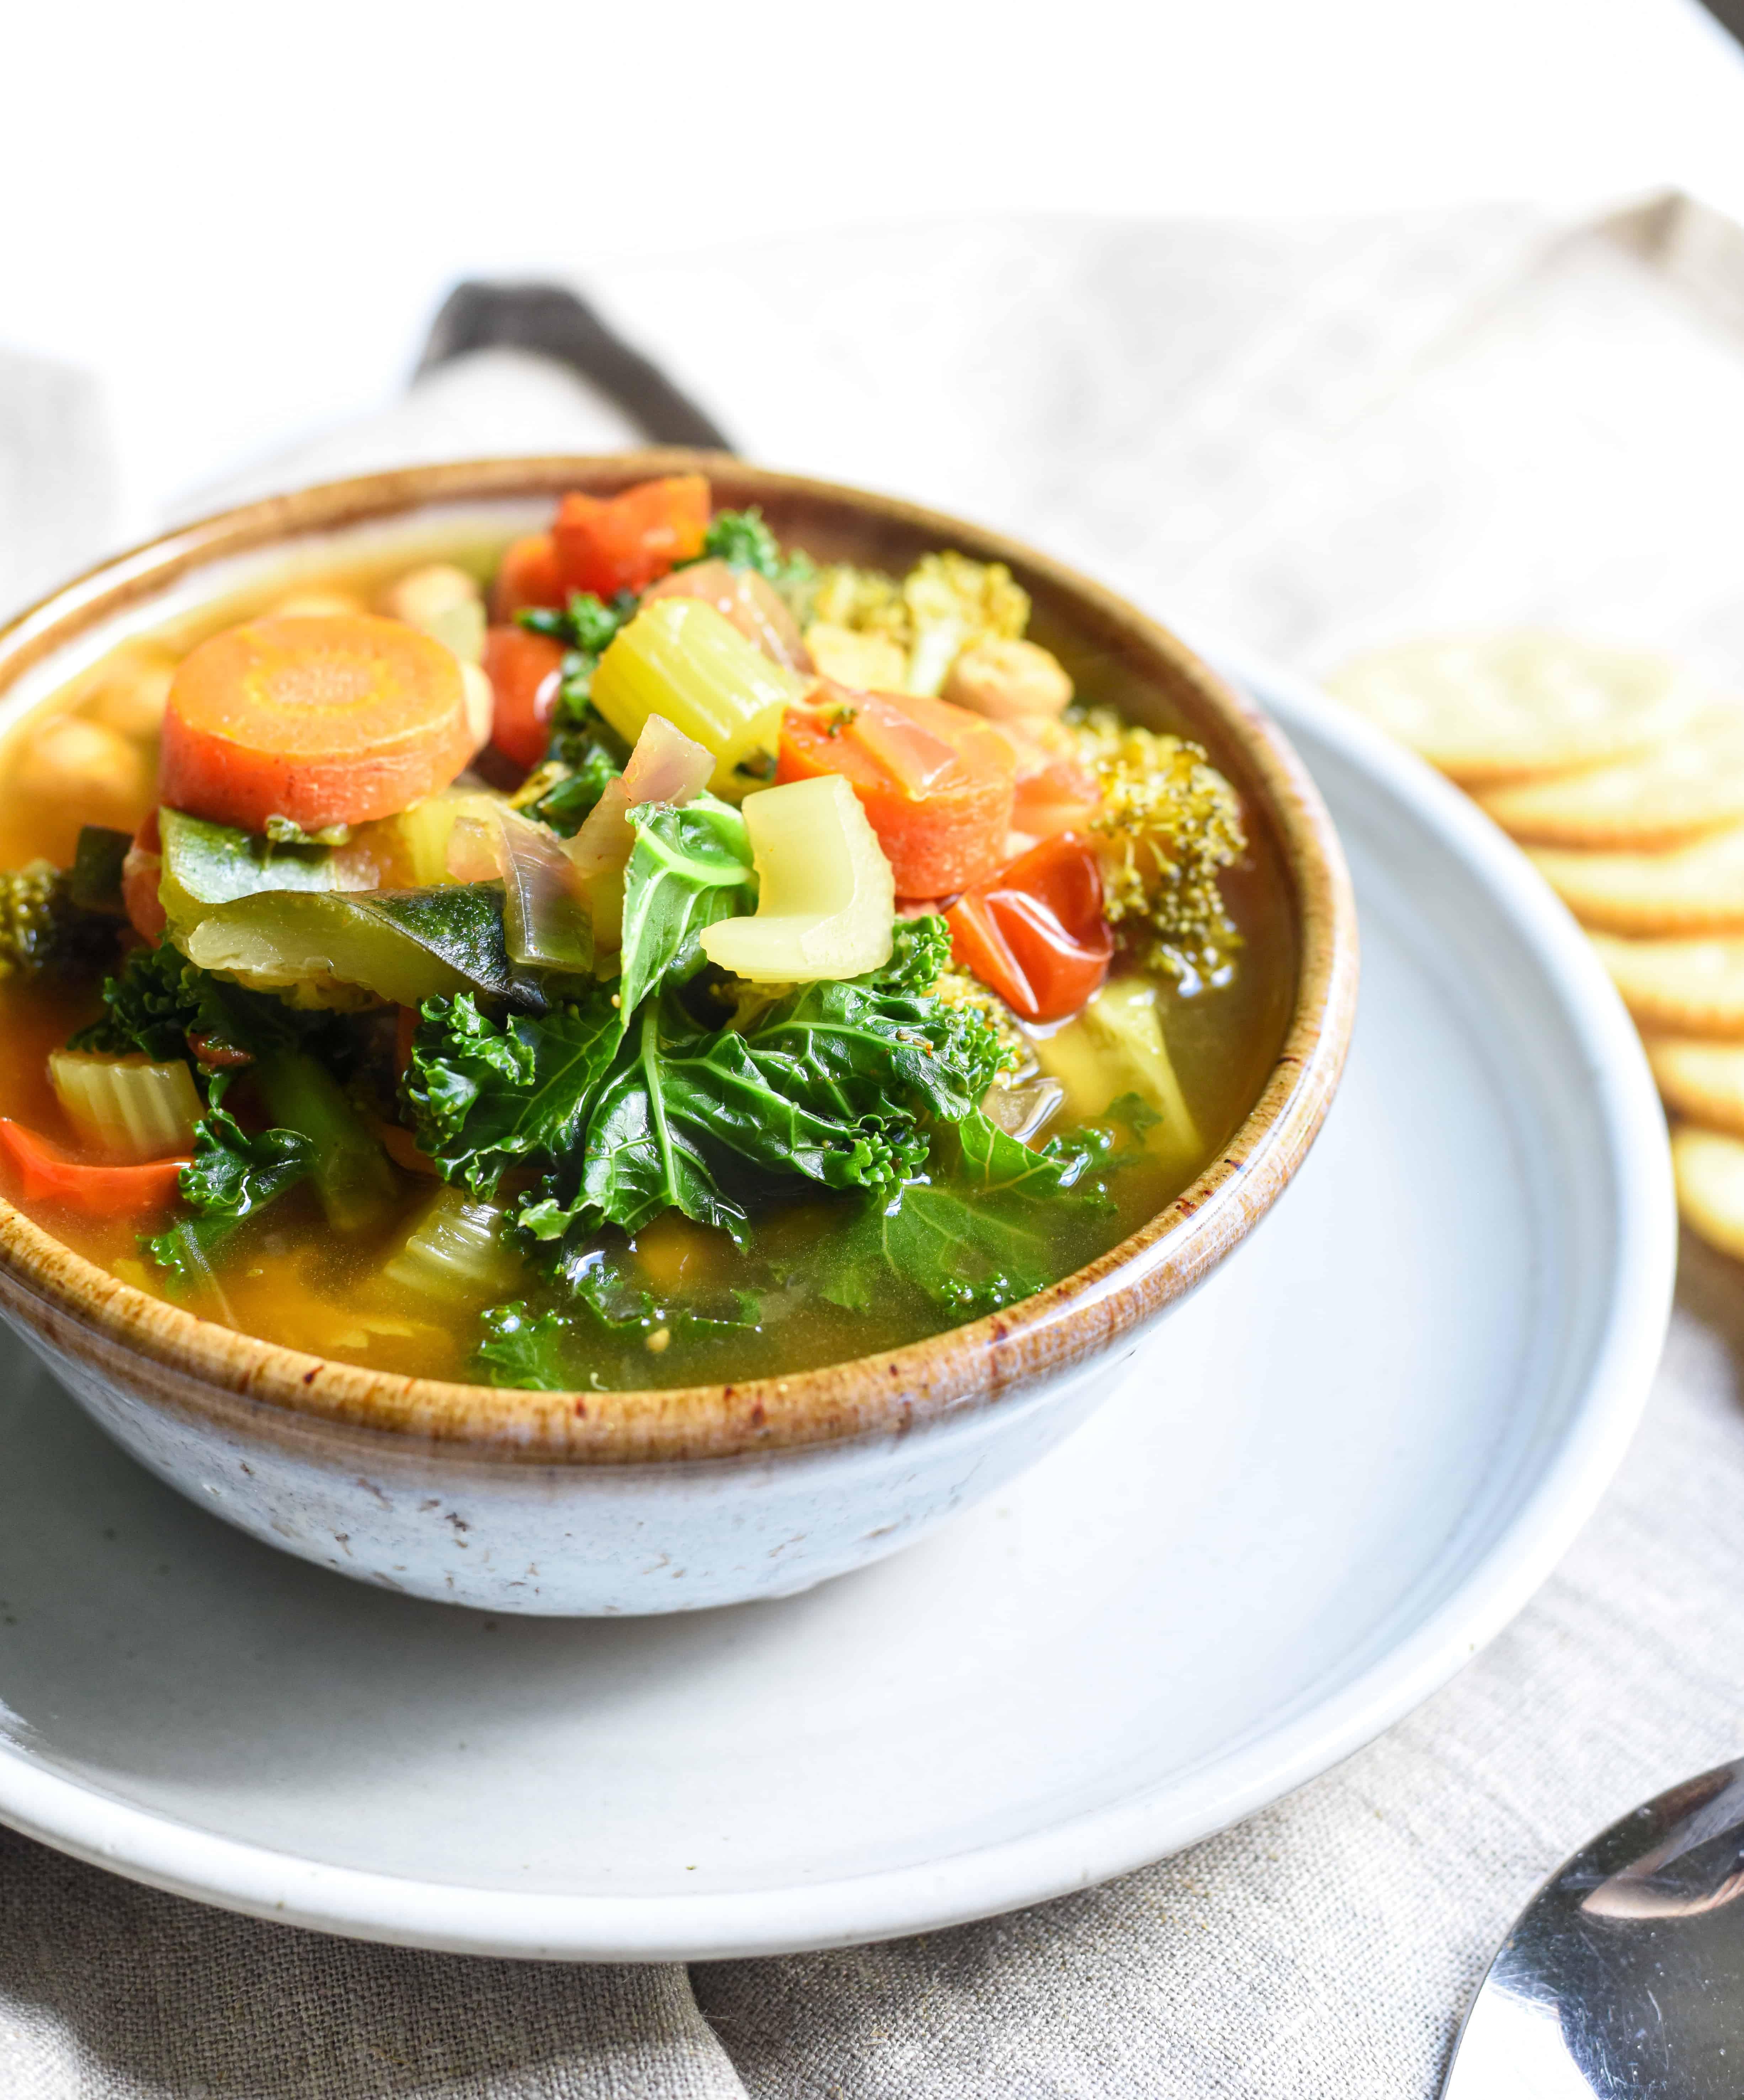 Comforting Homemade Vegetable Soup